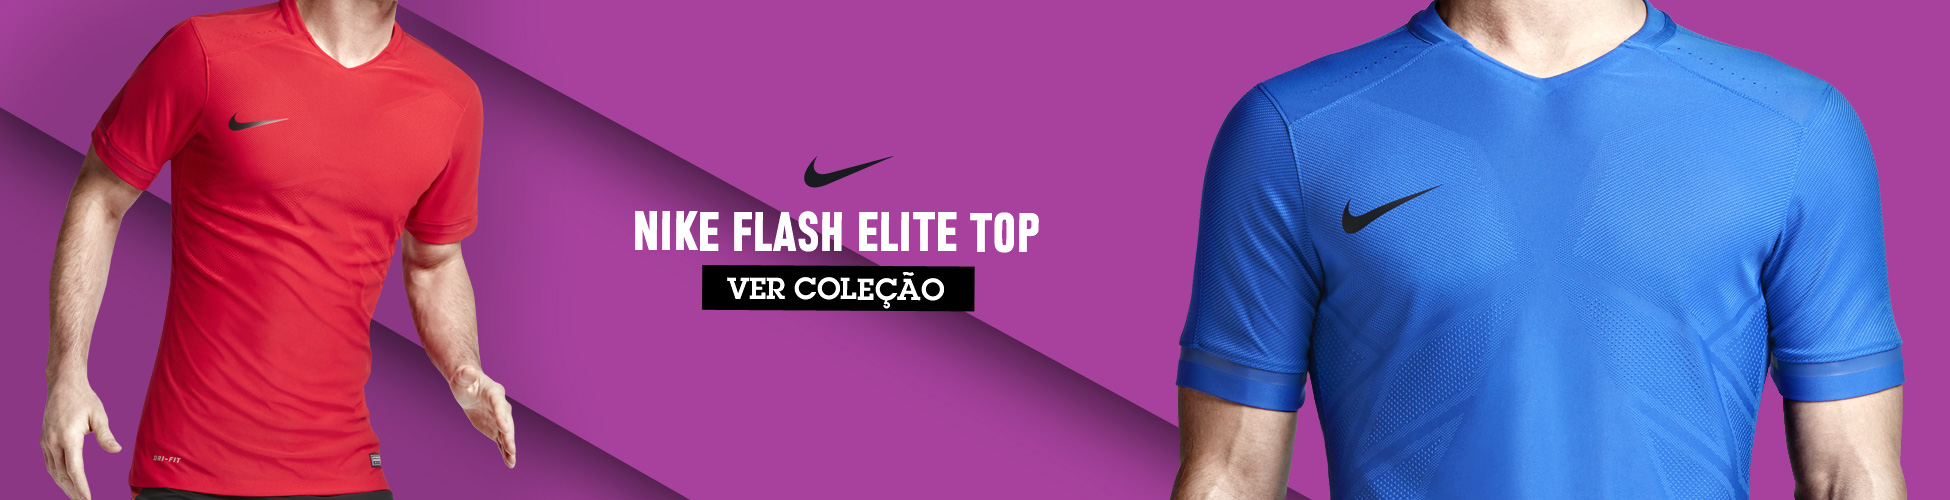 Nike Flash Elite Top